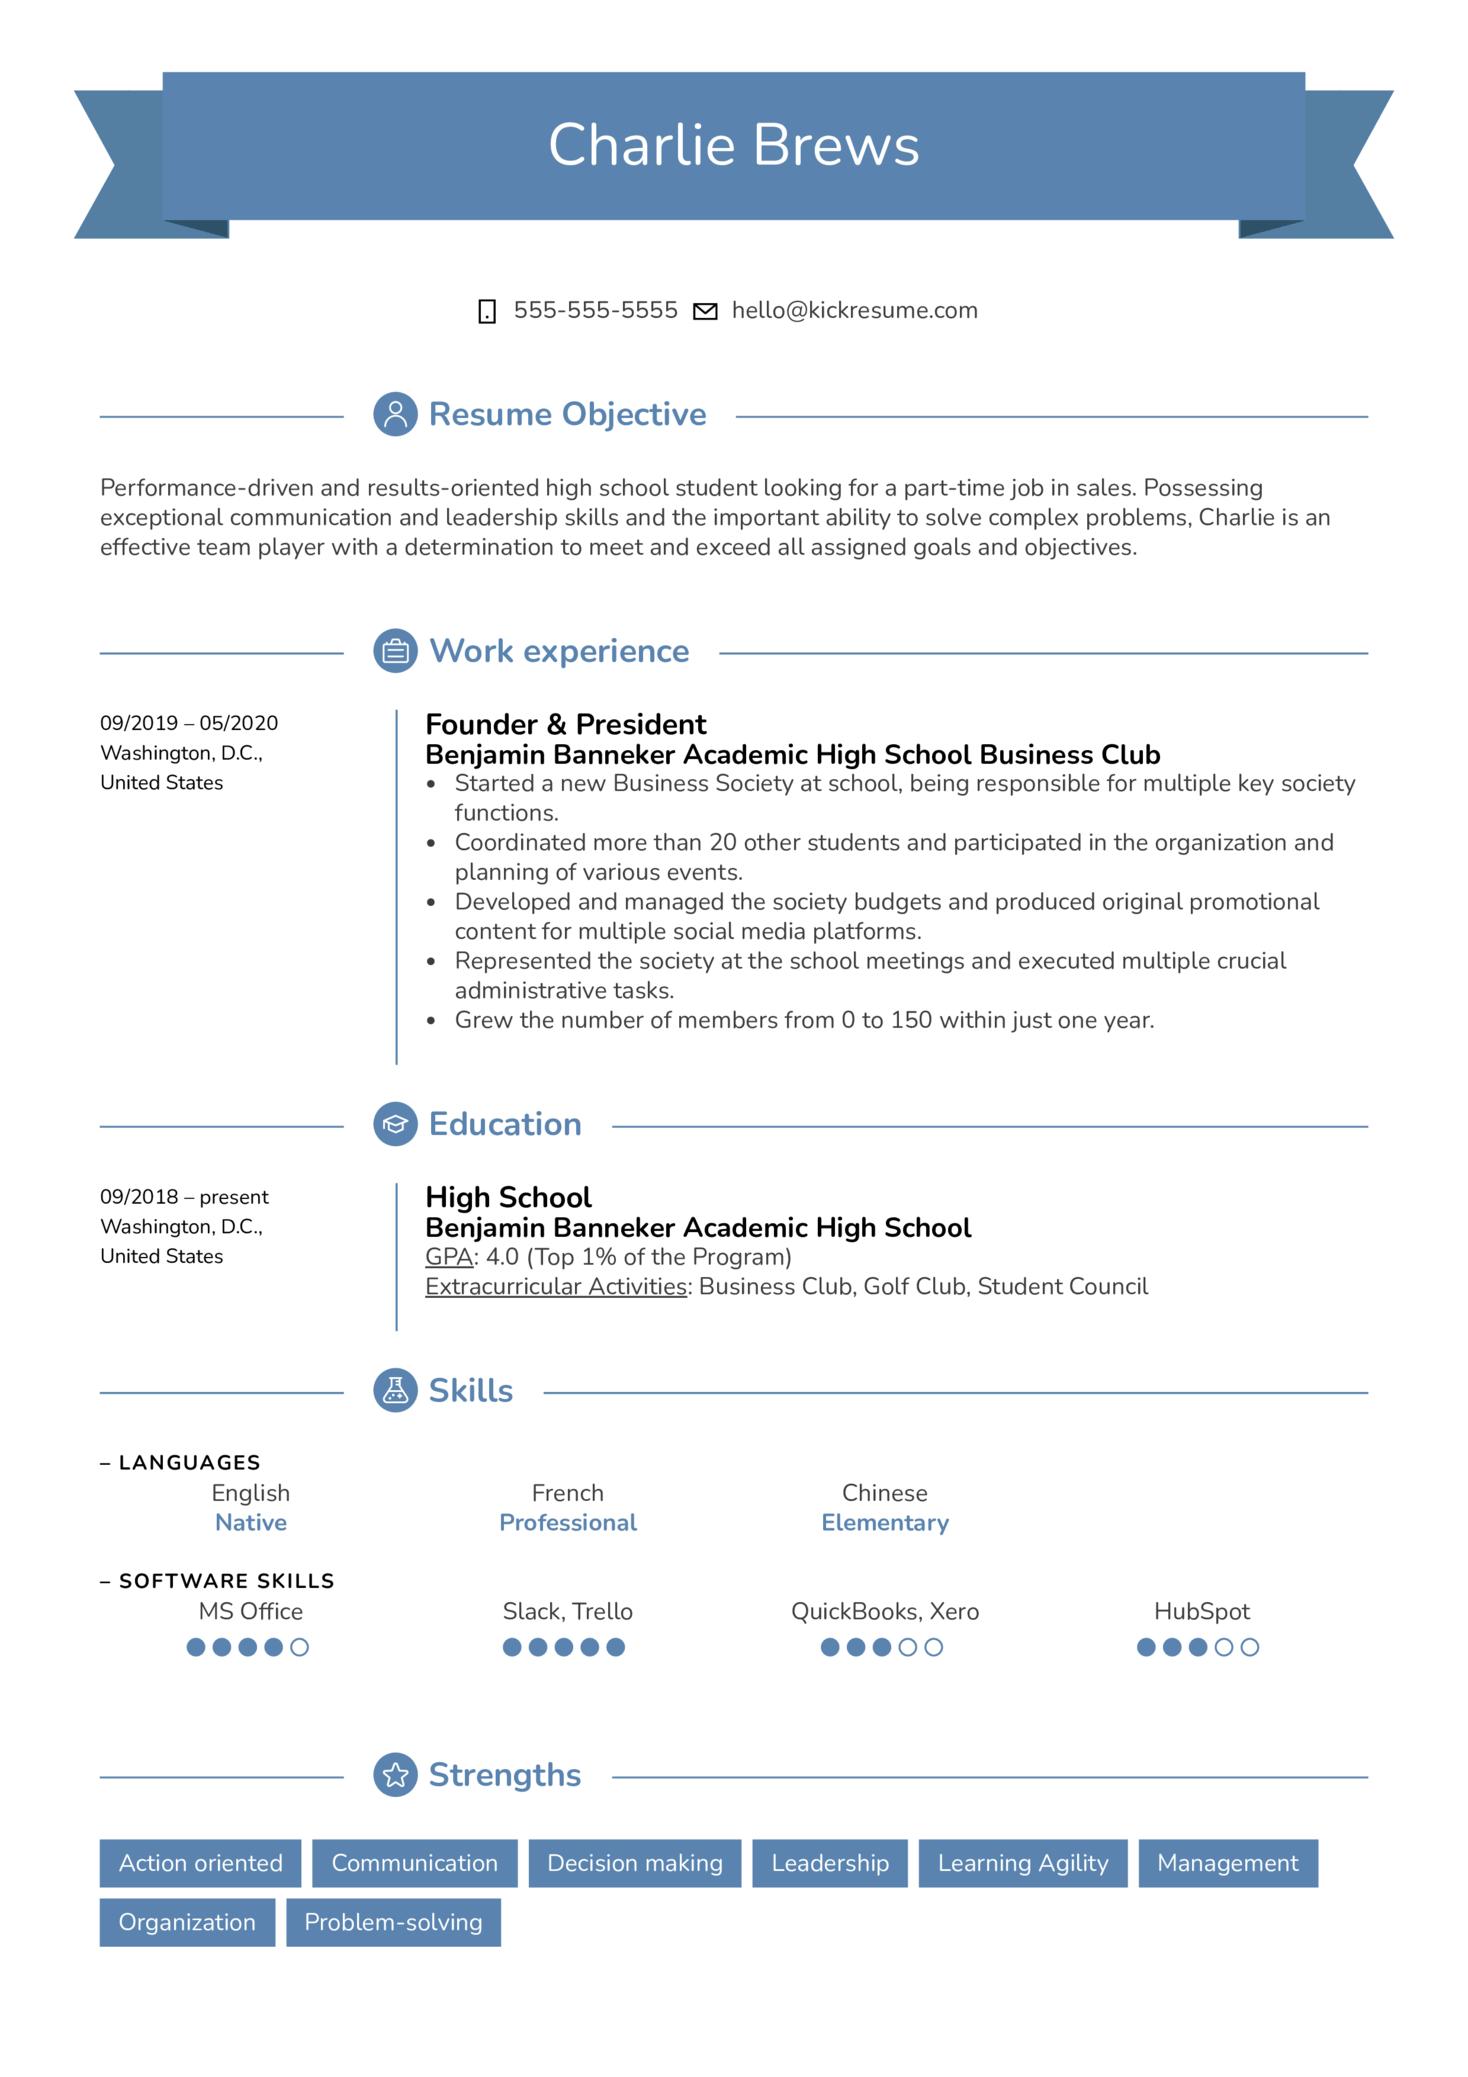 Part-Time Job Resume Sample (Part 1)